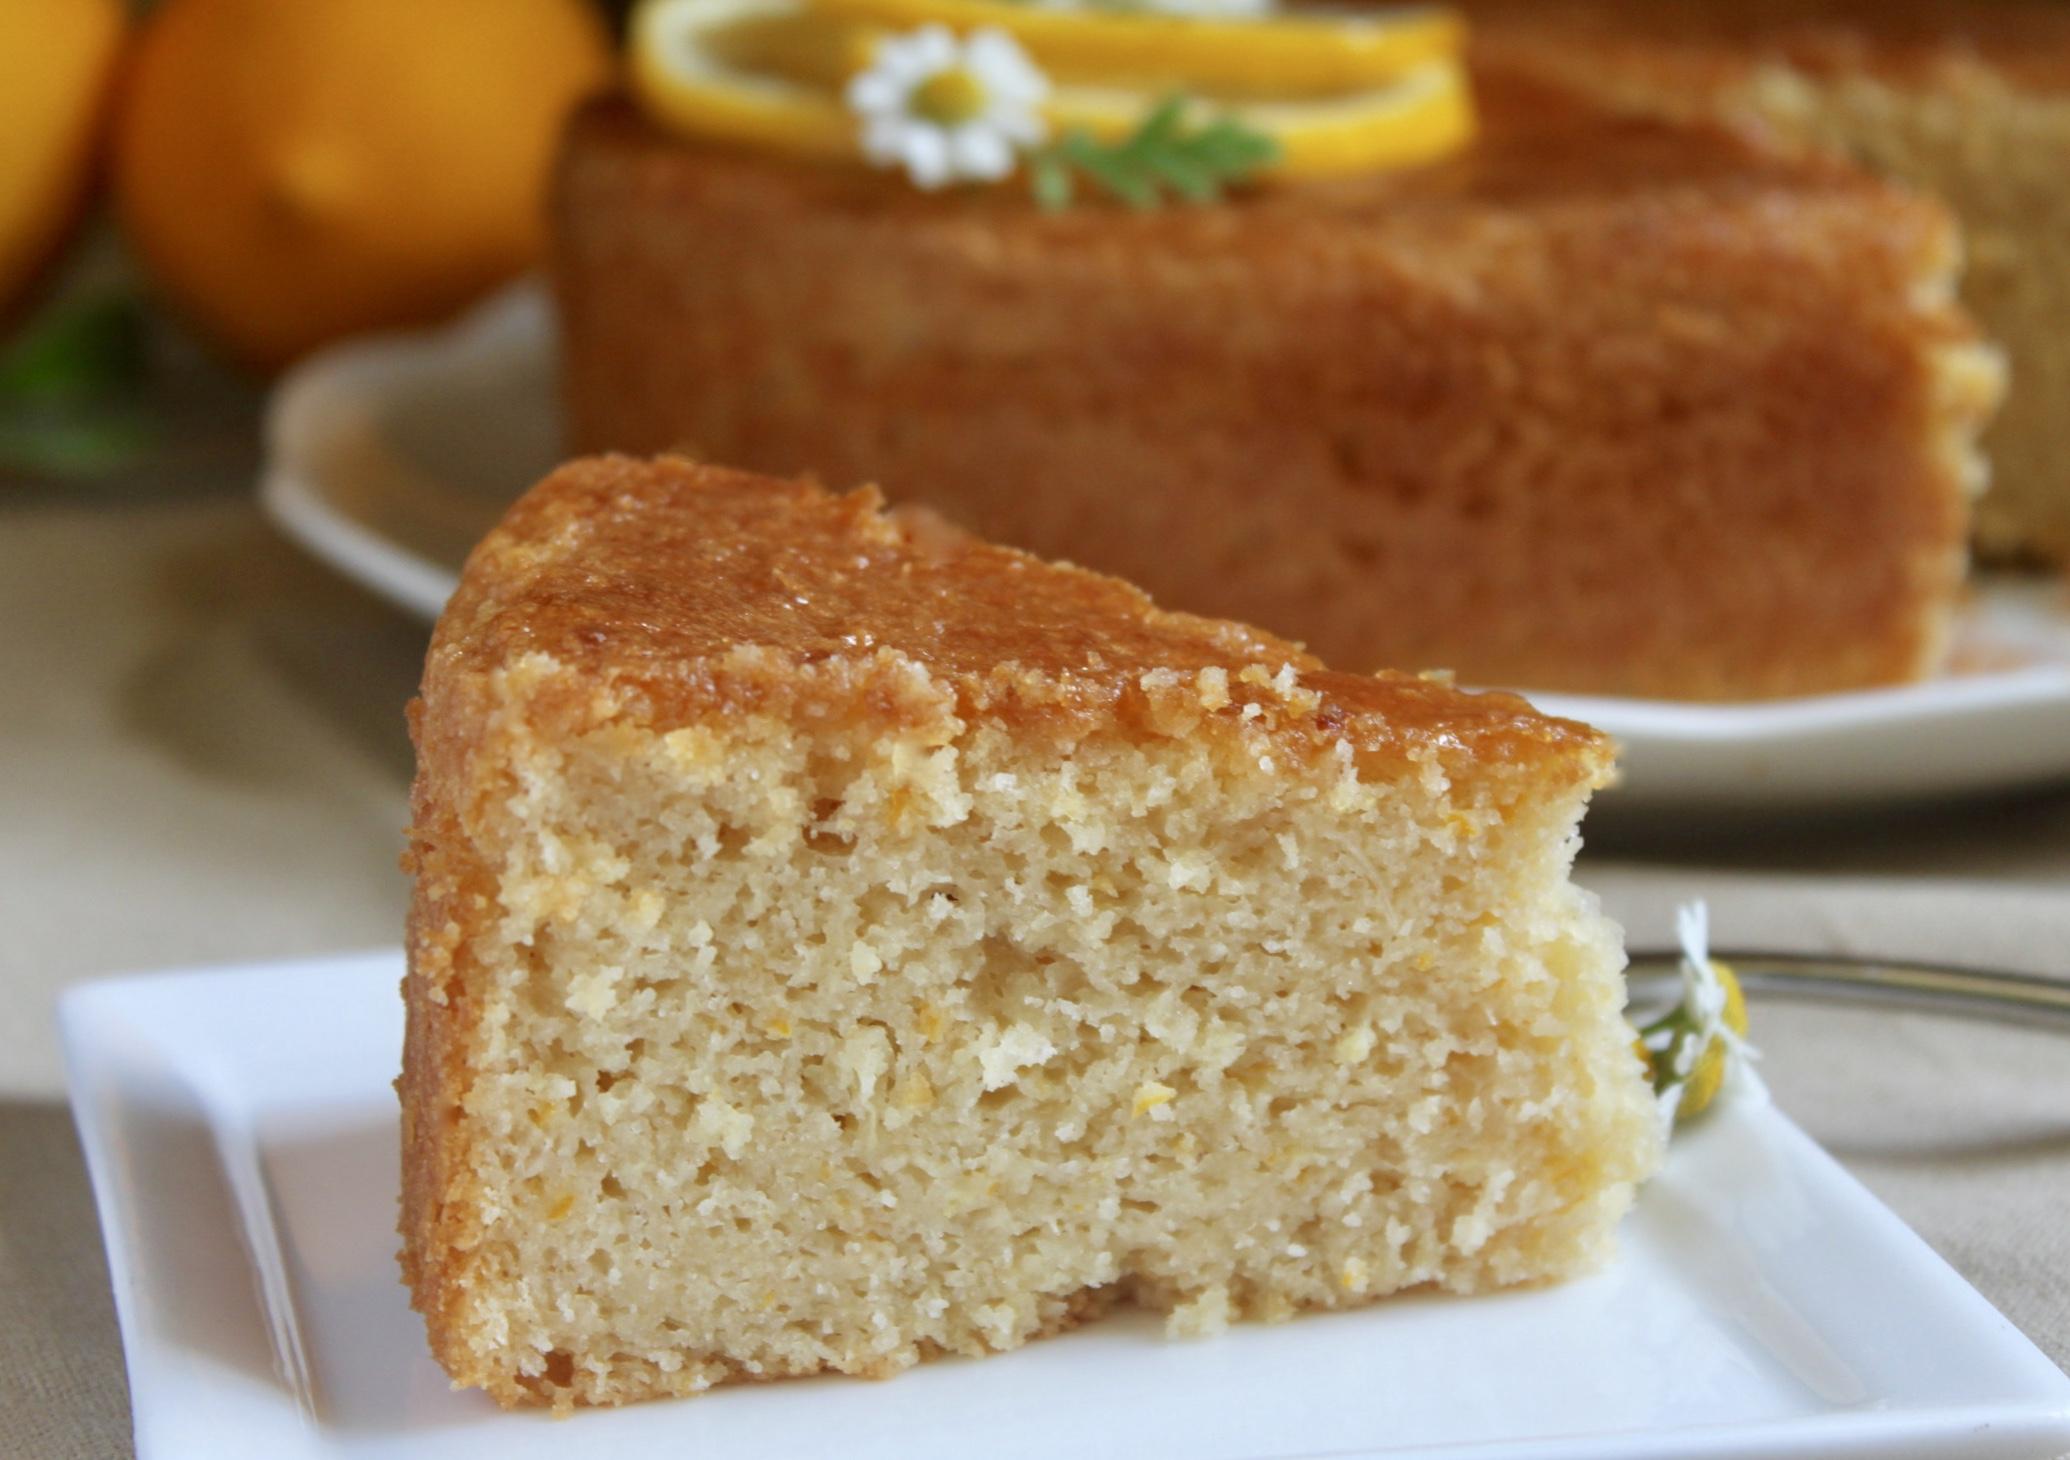 slice of gluten free lemon cake on a plate